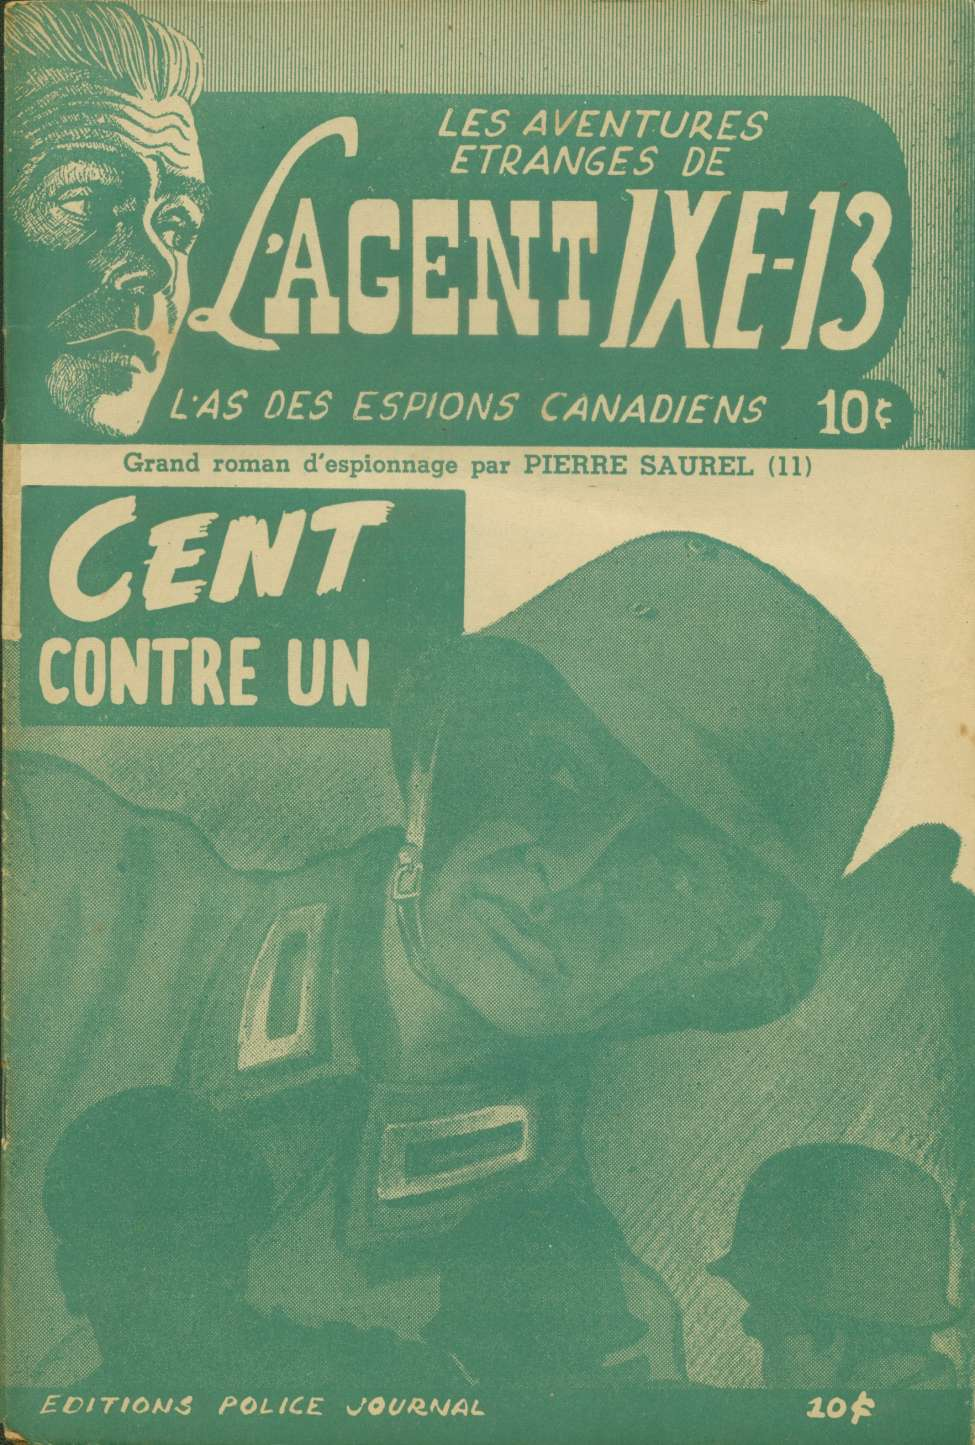 Comic Book Cover For L'Agent IXE-13 v2 011 - Cent contre un